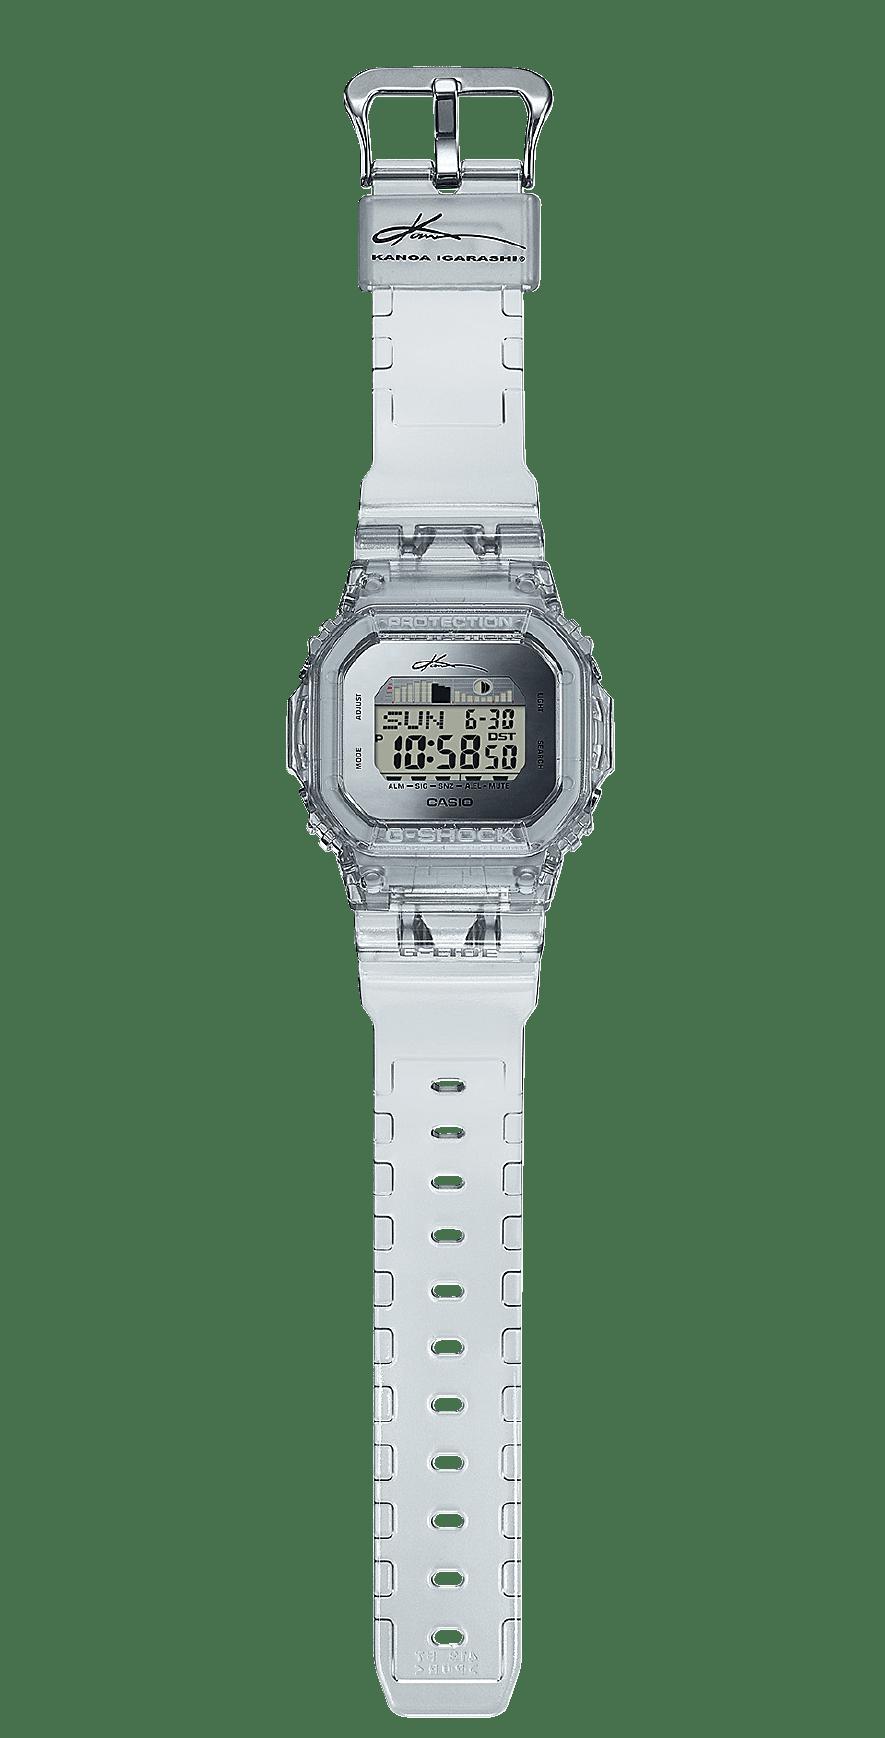 Details about Casio G SHOCK GLX 5600KI 7 Kanoa Igarashi Signature Limited Edition Surf Watch